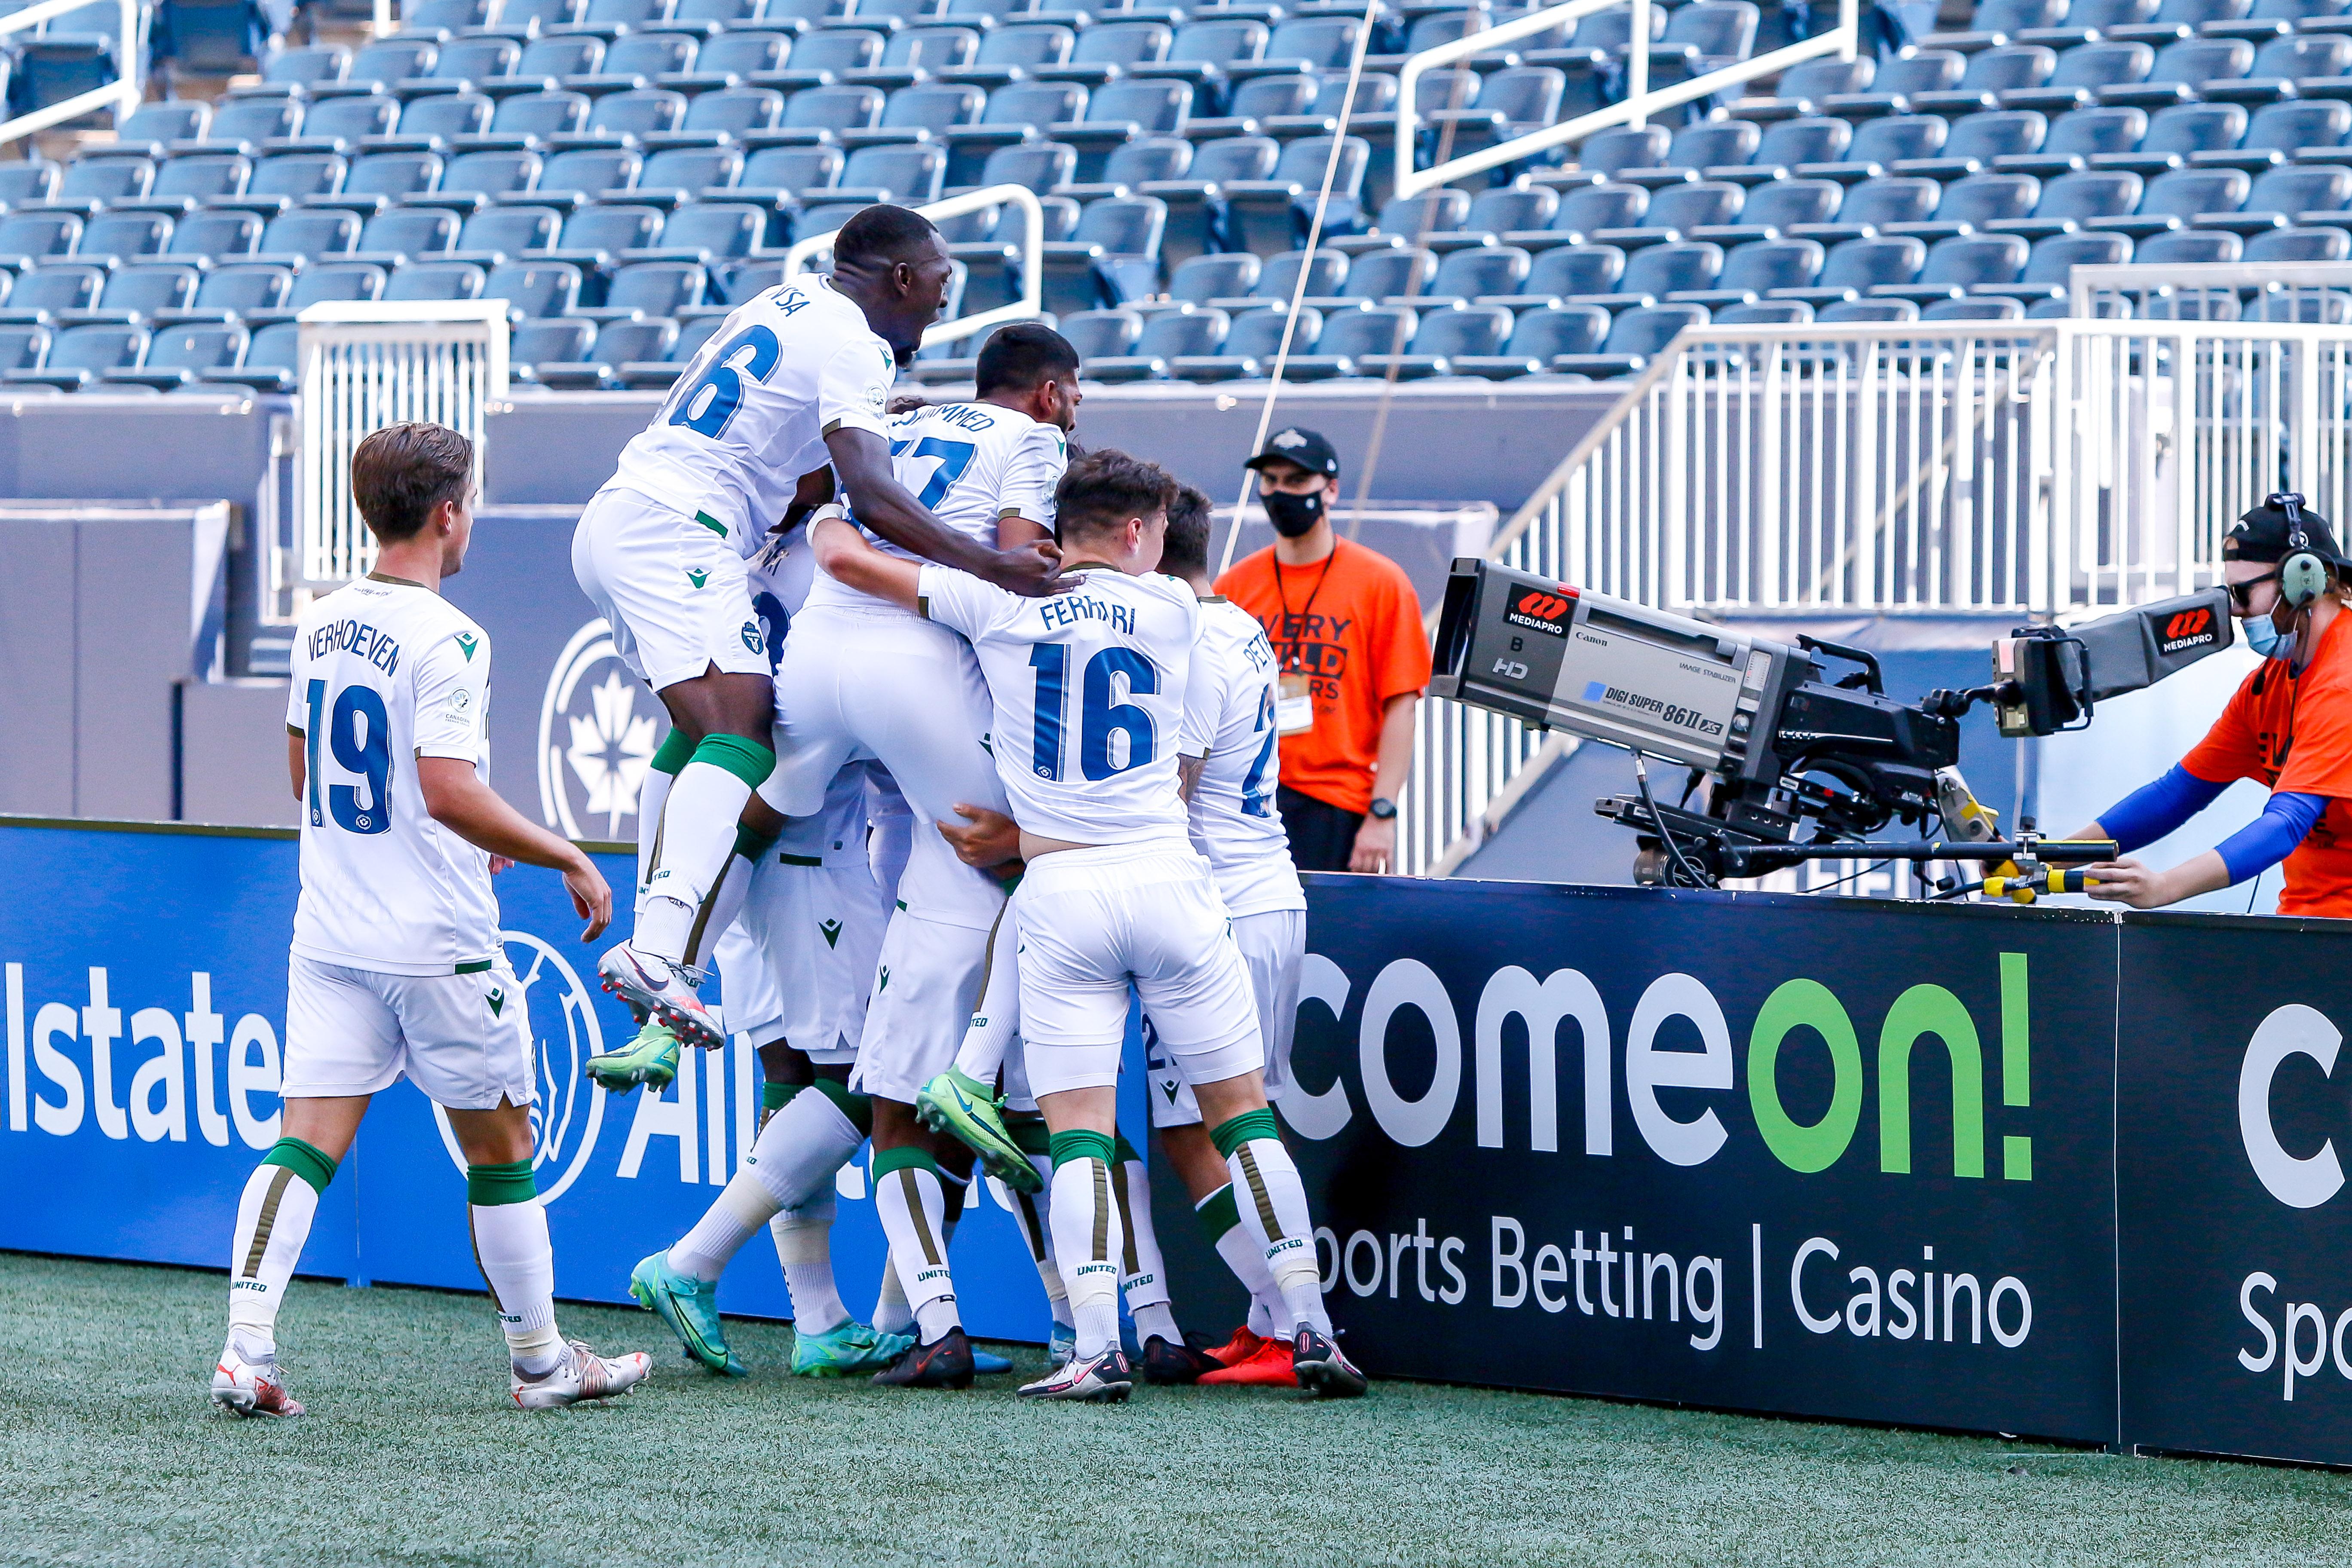 York United FC players celebrate a first-half goal by Diyaeddine Abzi. (CPL)